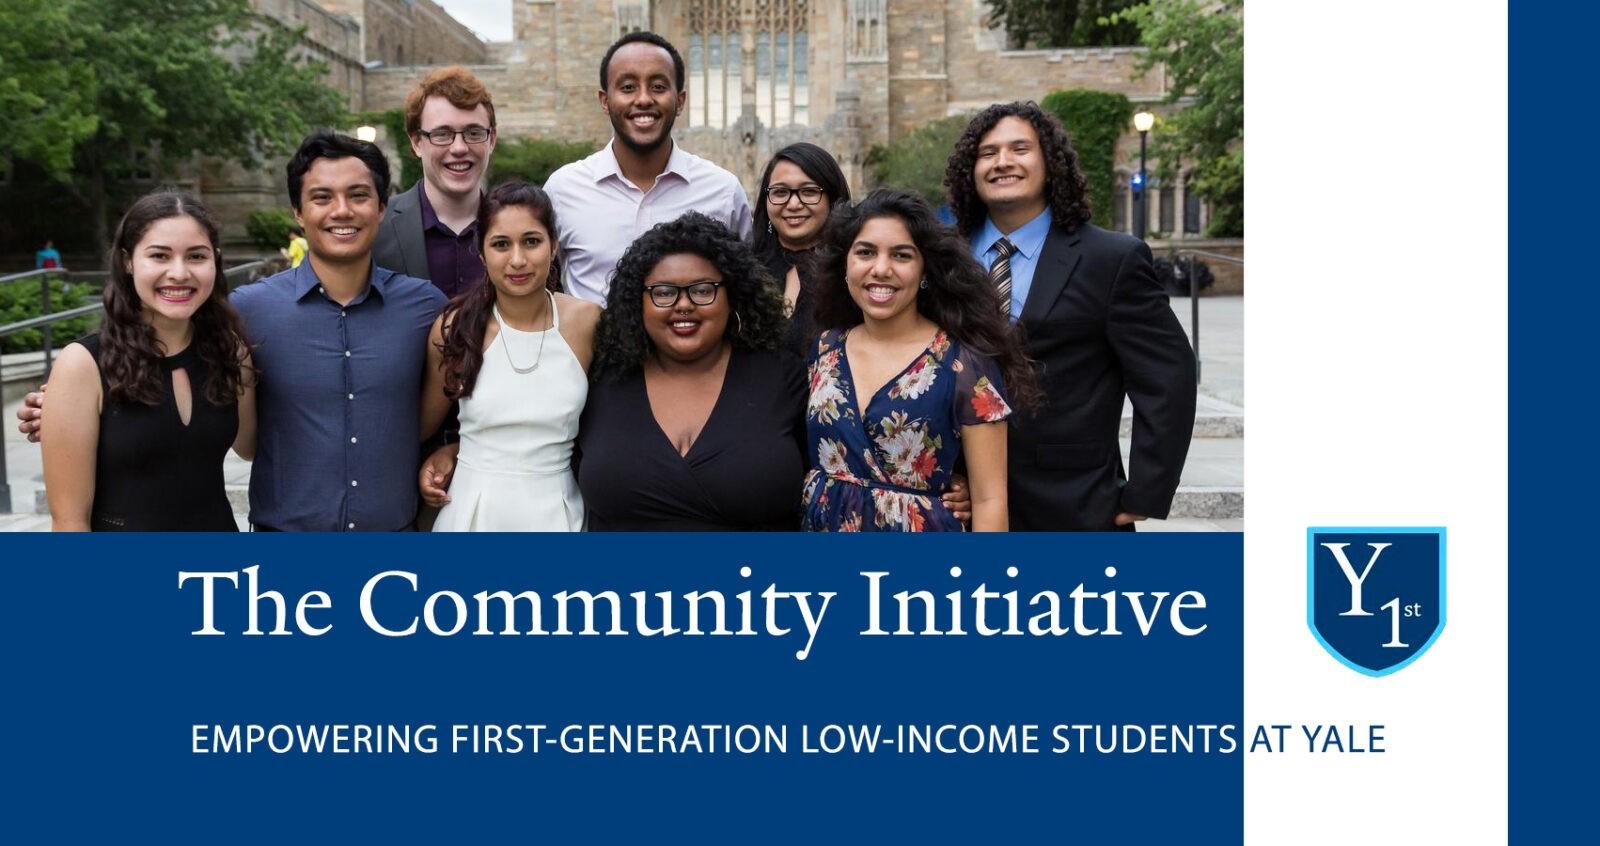 community Initiative at Yale